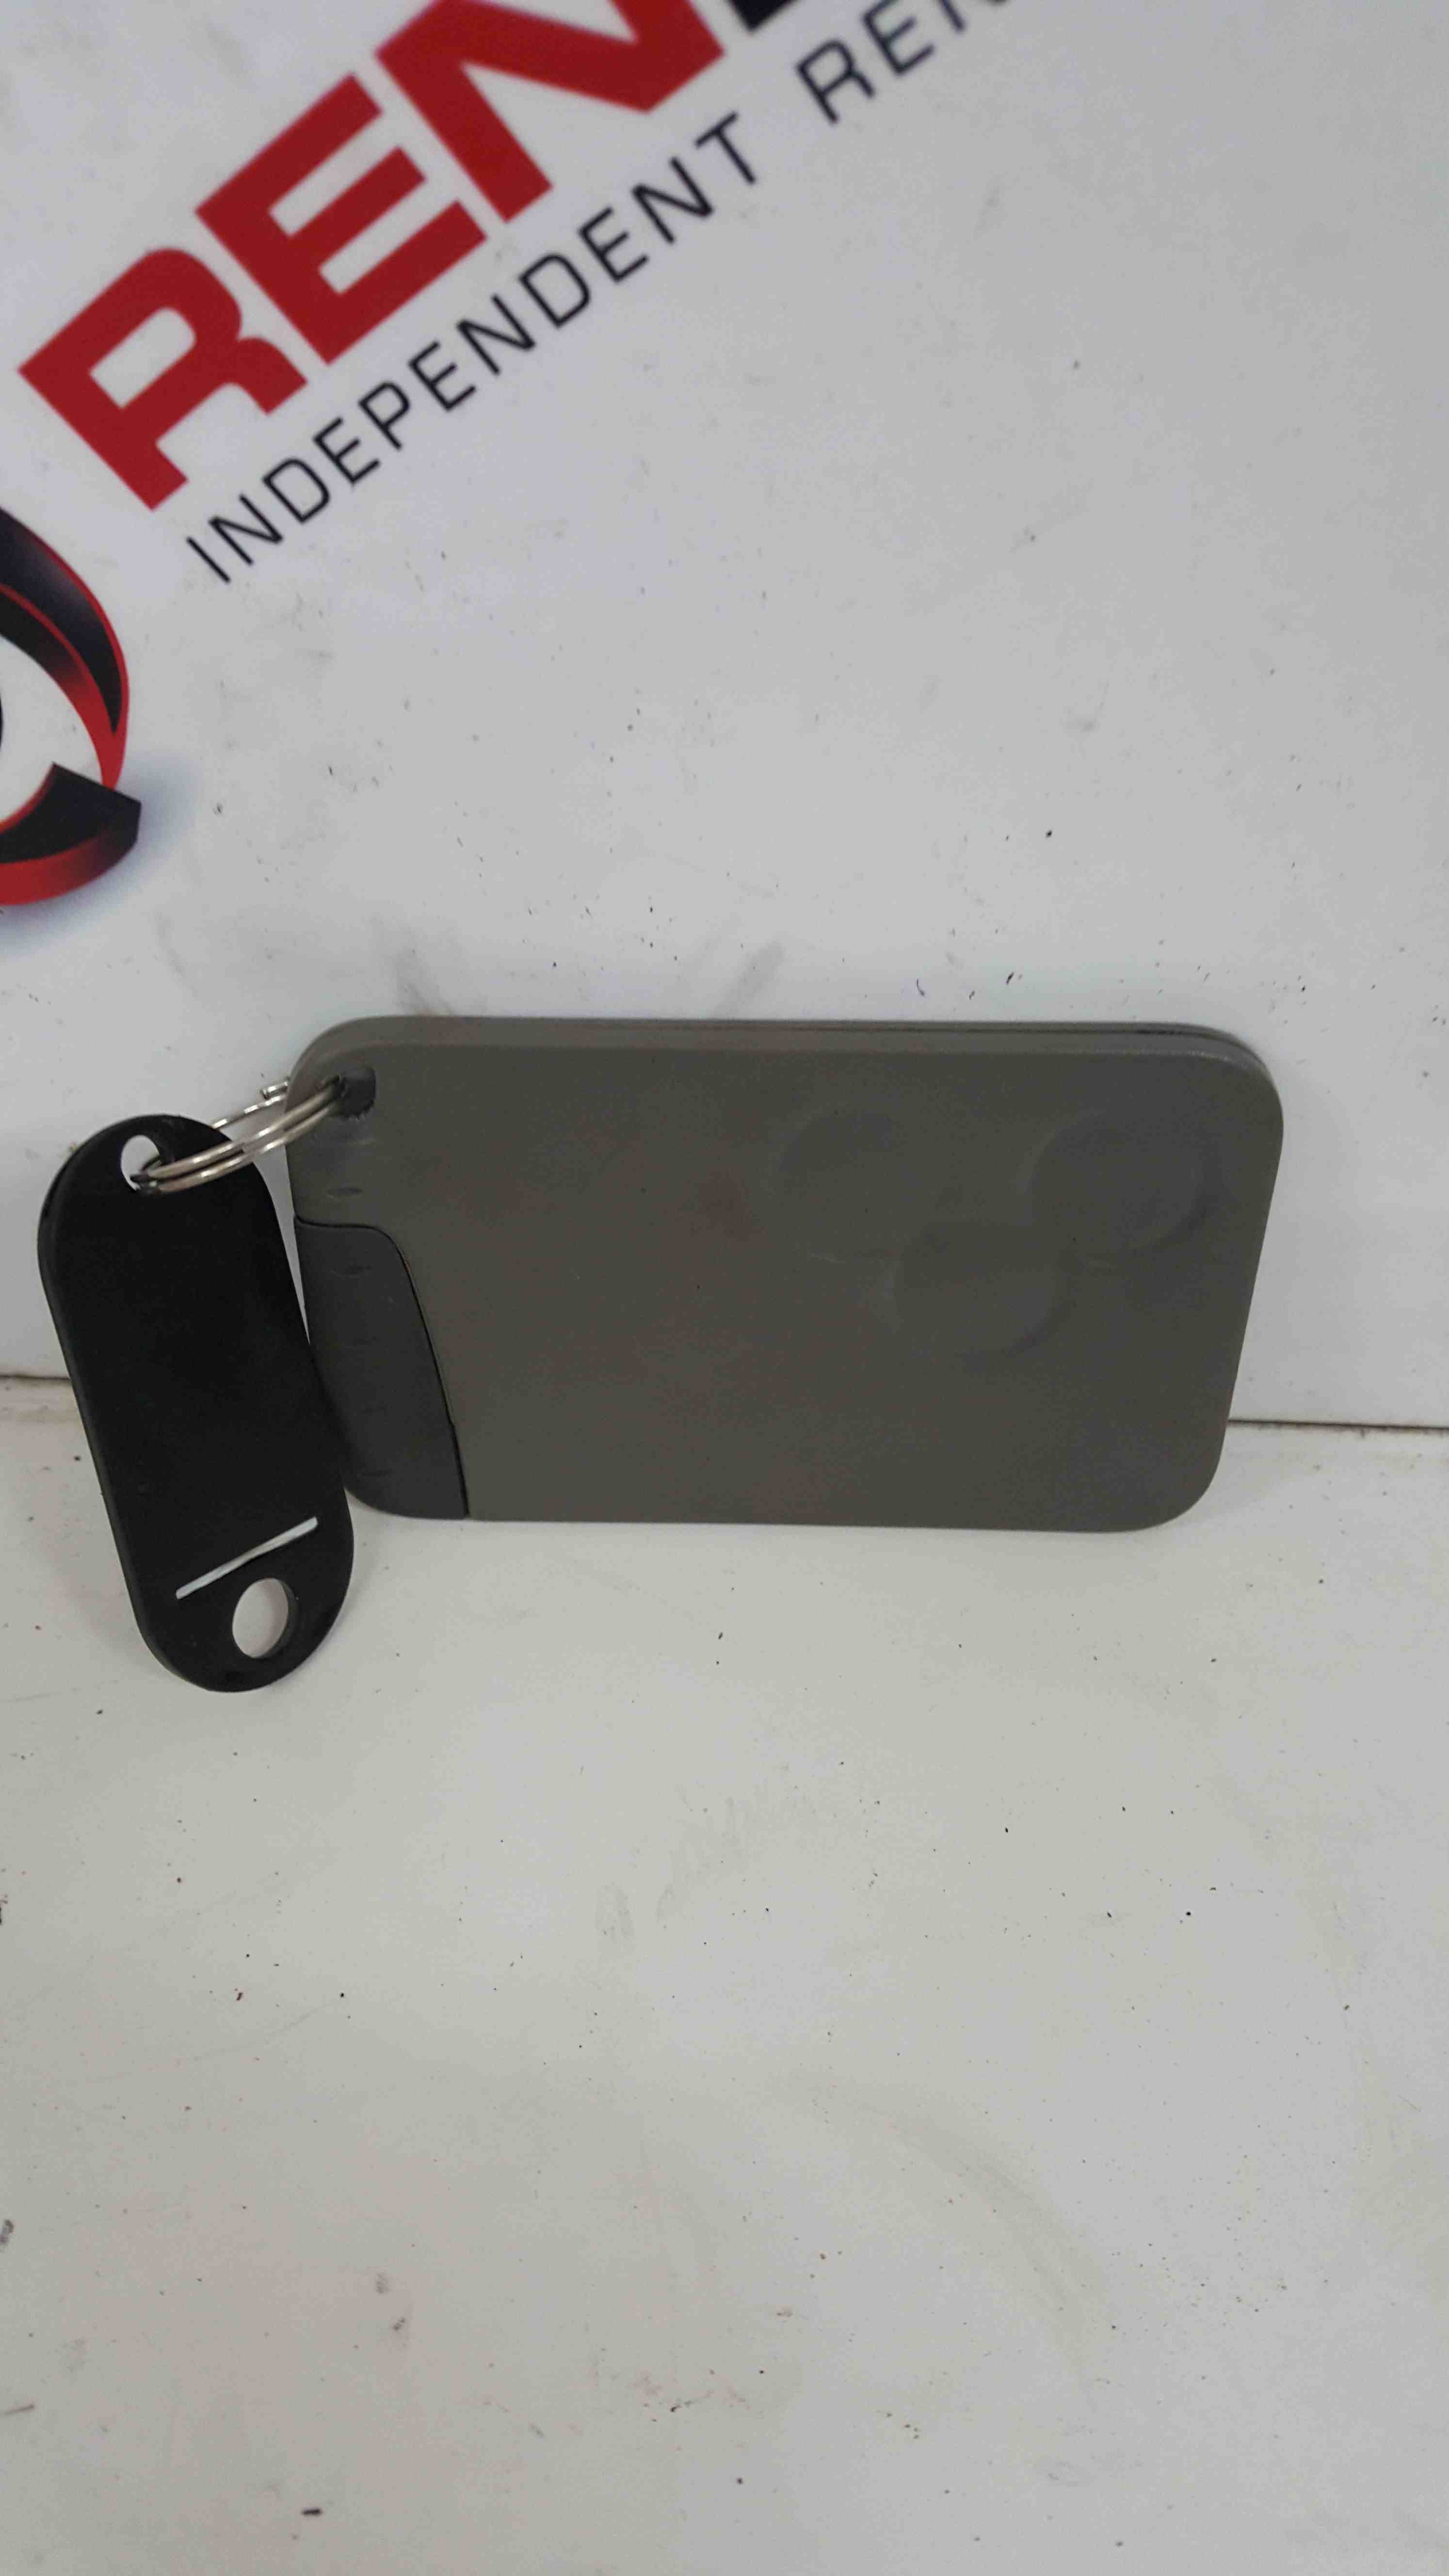 Renault Espace 2003-2013 Key Card Case